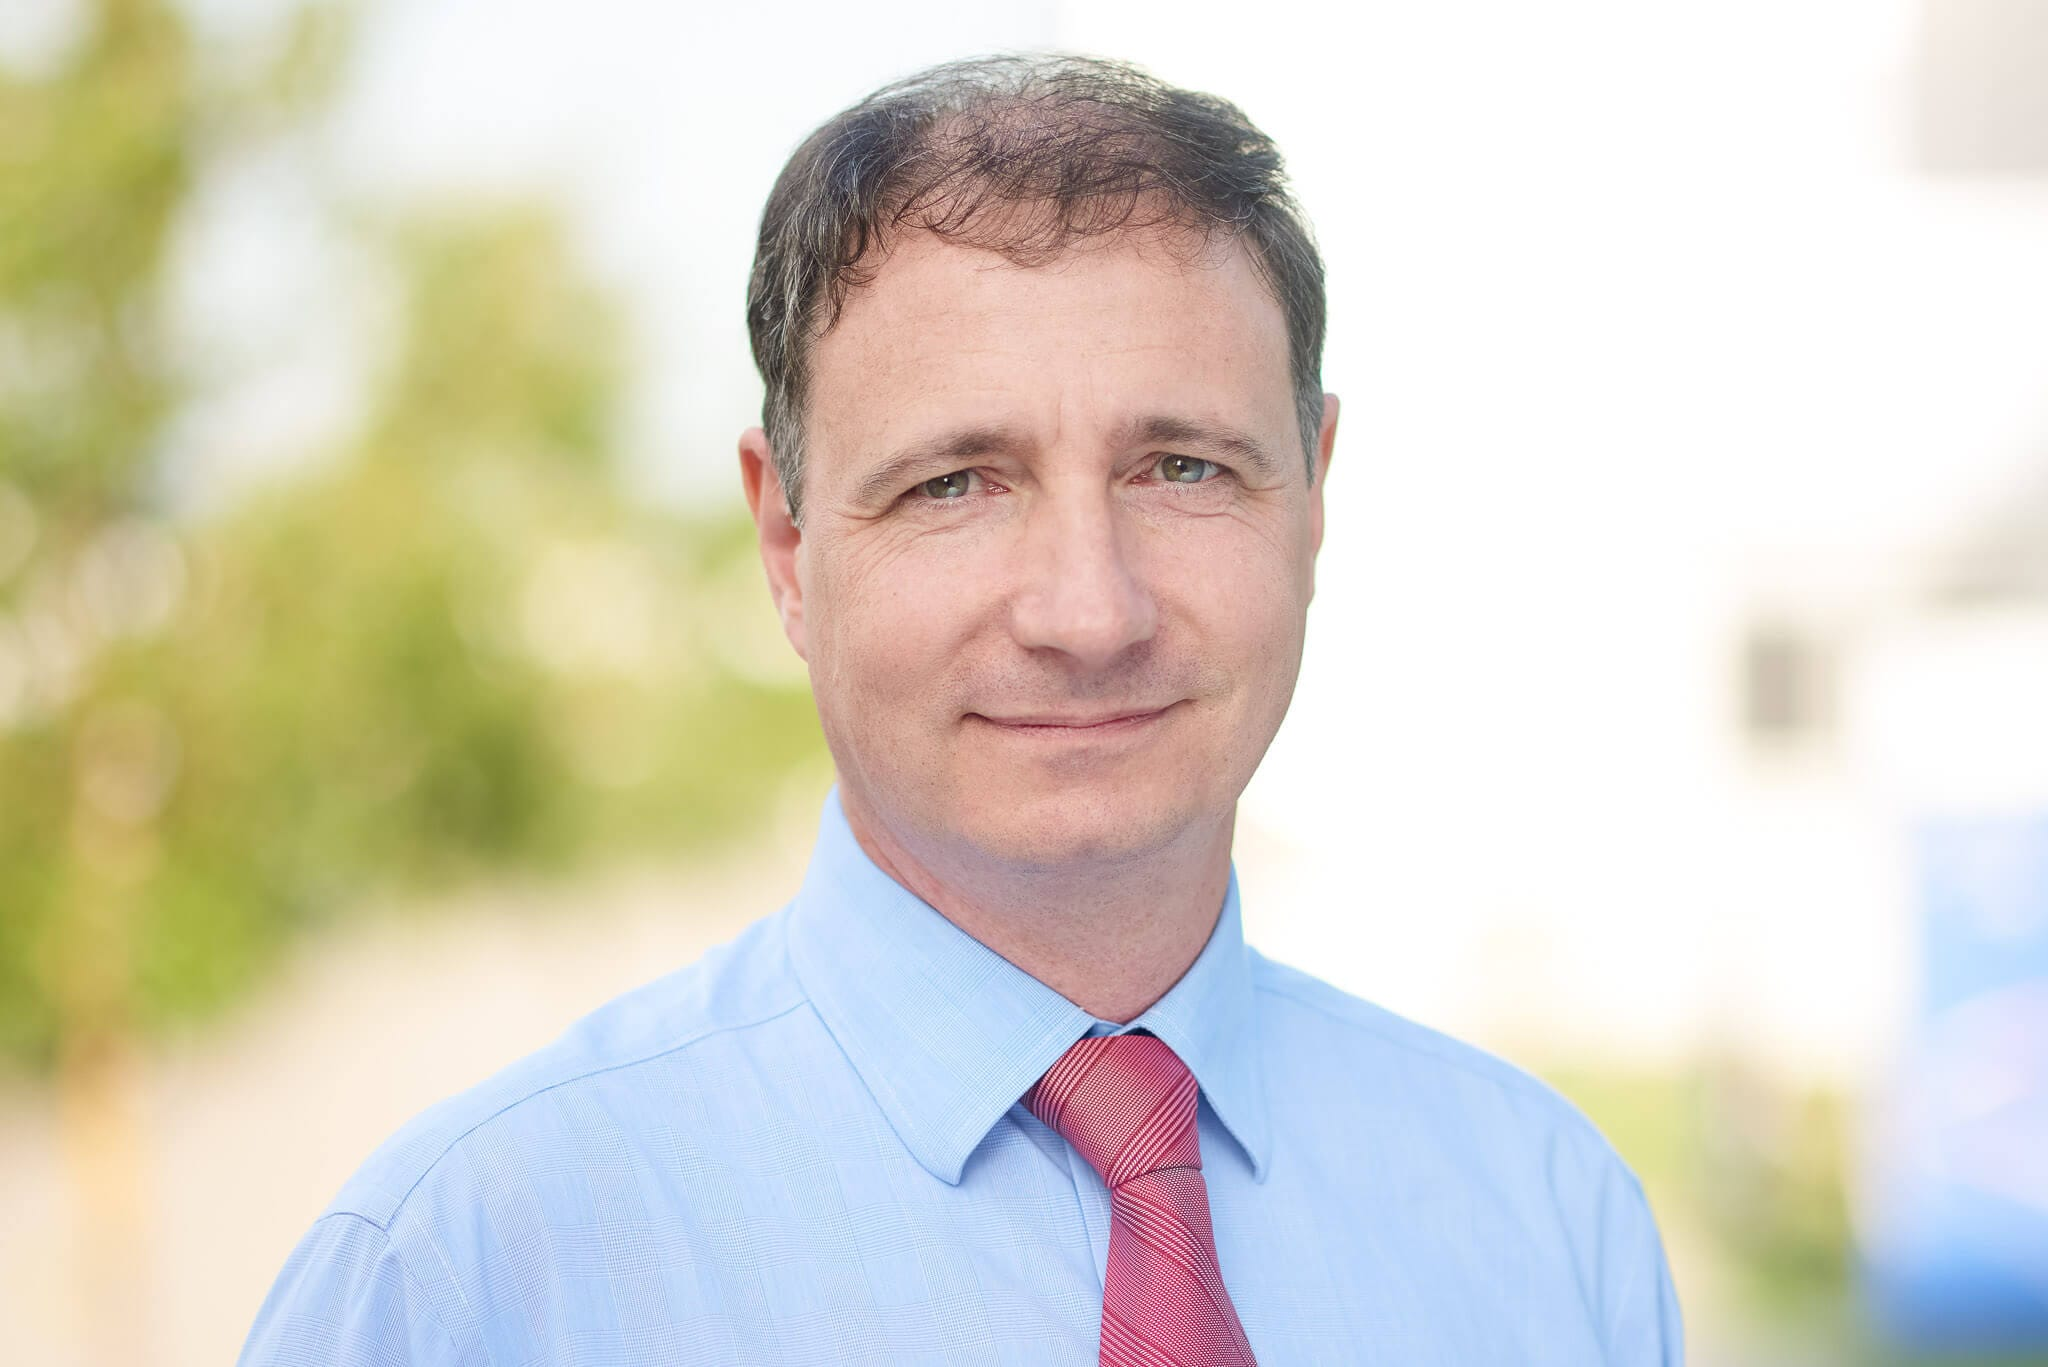 Reinhold Horlacher, managing director & CSO of trenzyme GmbH